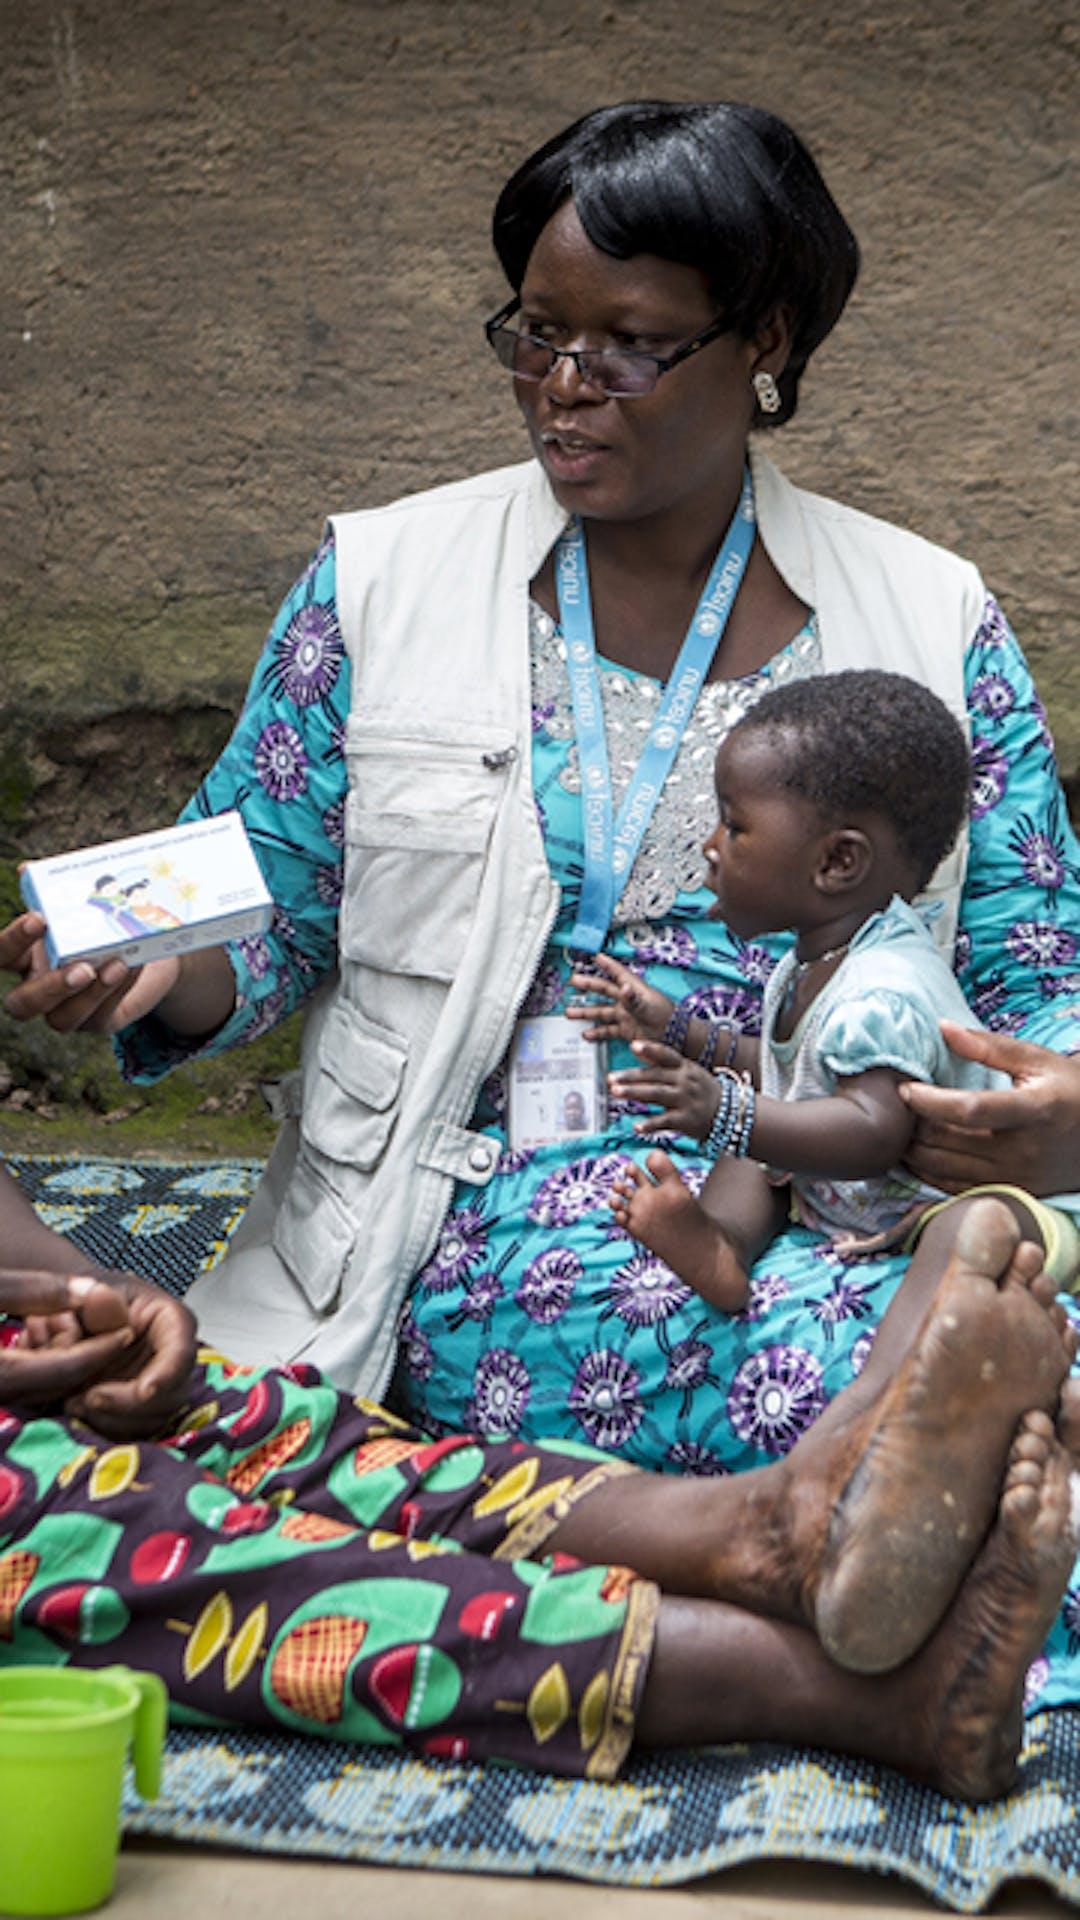 Fai crescere i bambini sani e forti, dona i micronutrienti